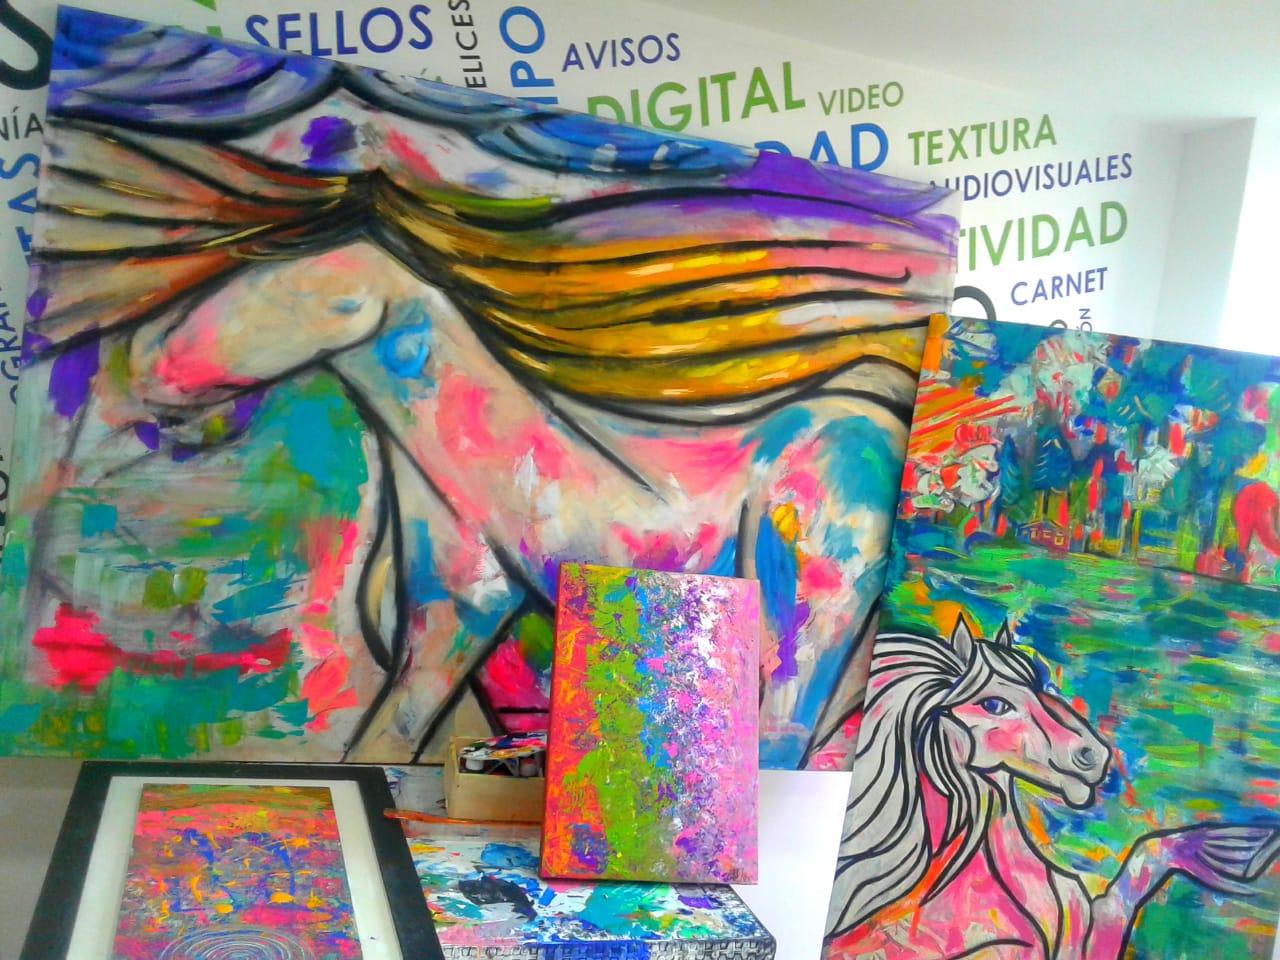 Talleres de obras de arte en medellin 13